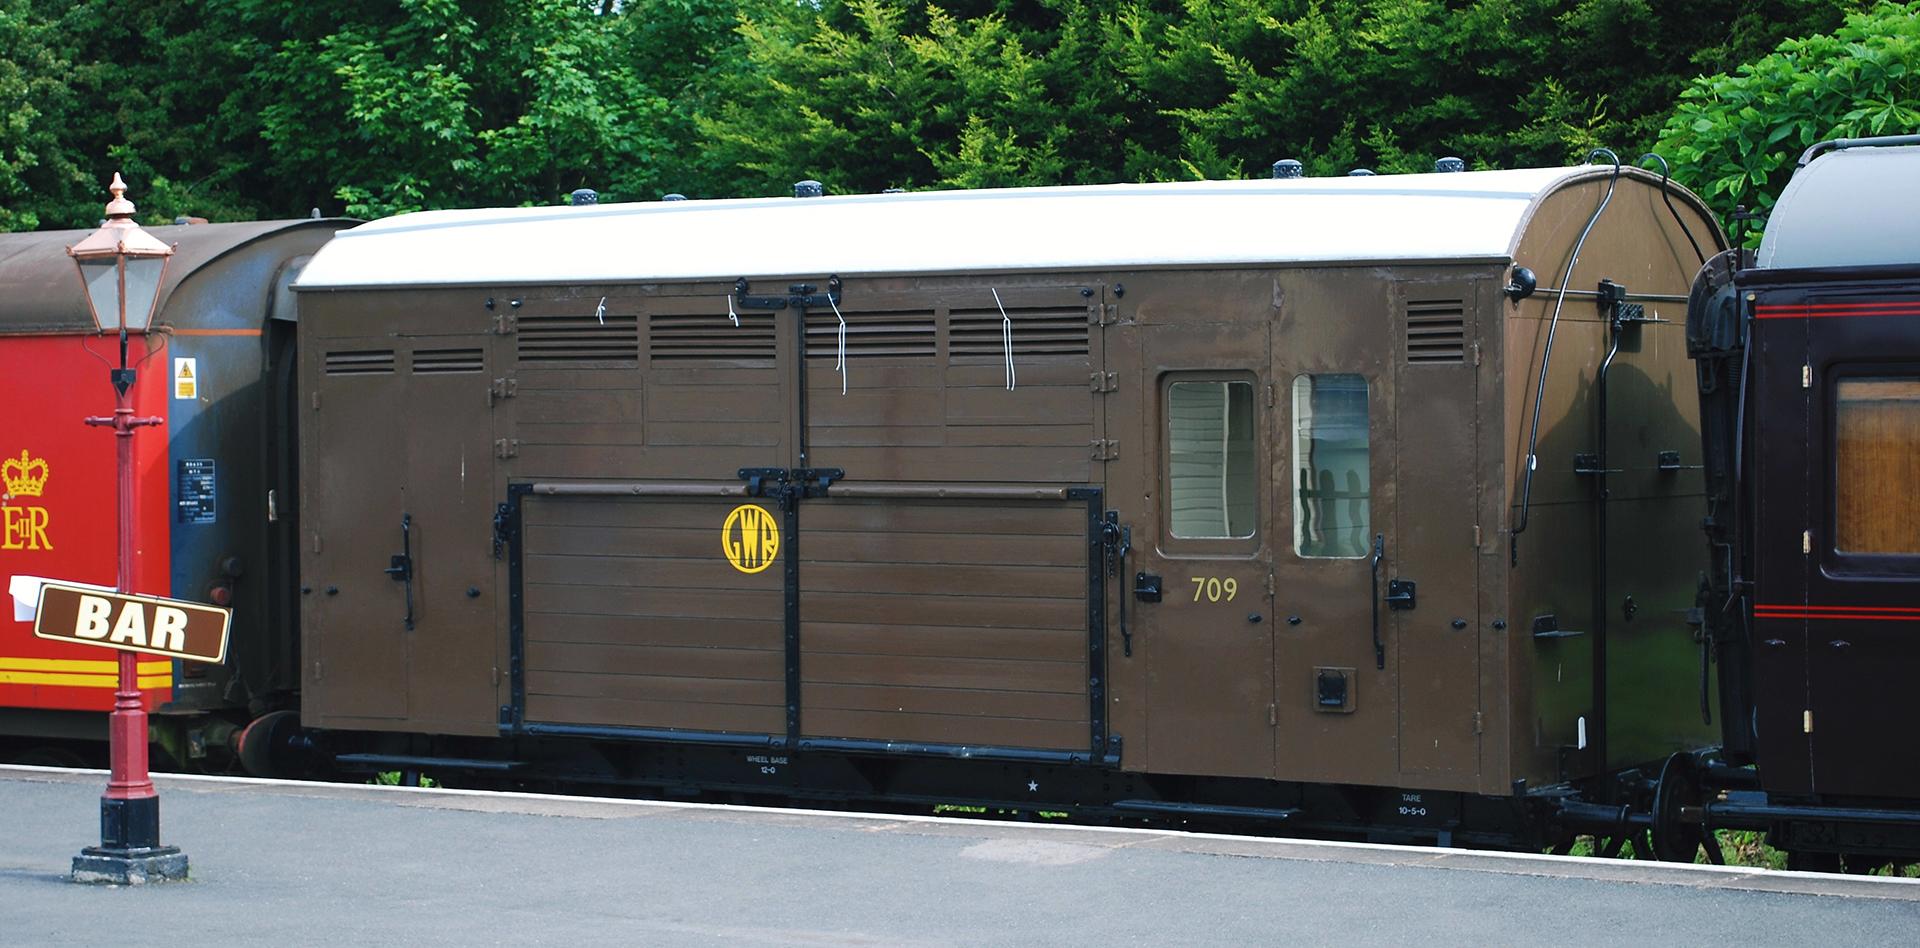 GWR Diagram N16 Horsebox No. 709 at the Winchcombe, Gloucestershire & Warwickshire Railway in June 2010. © Hugh Llewelyn